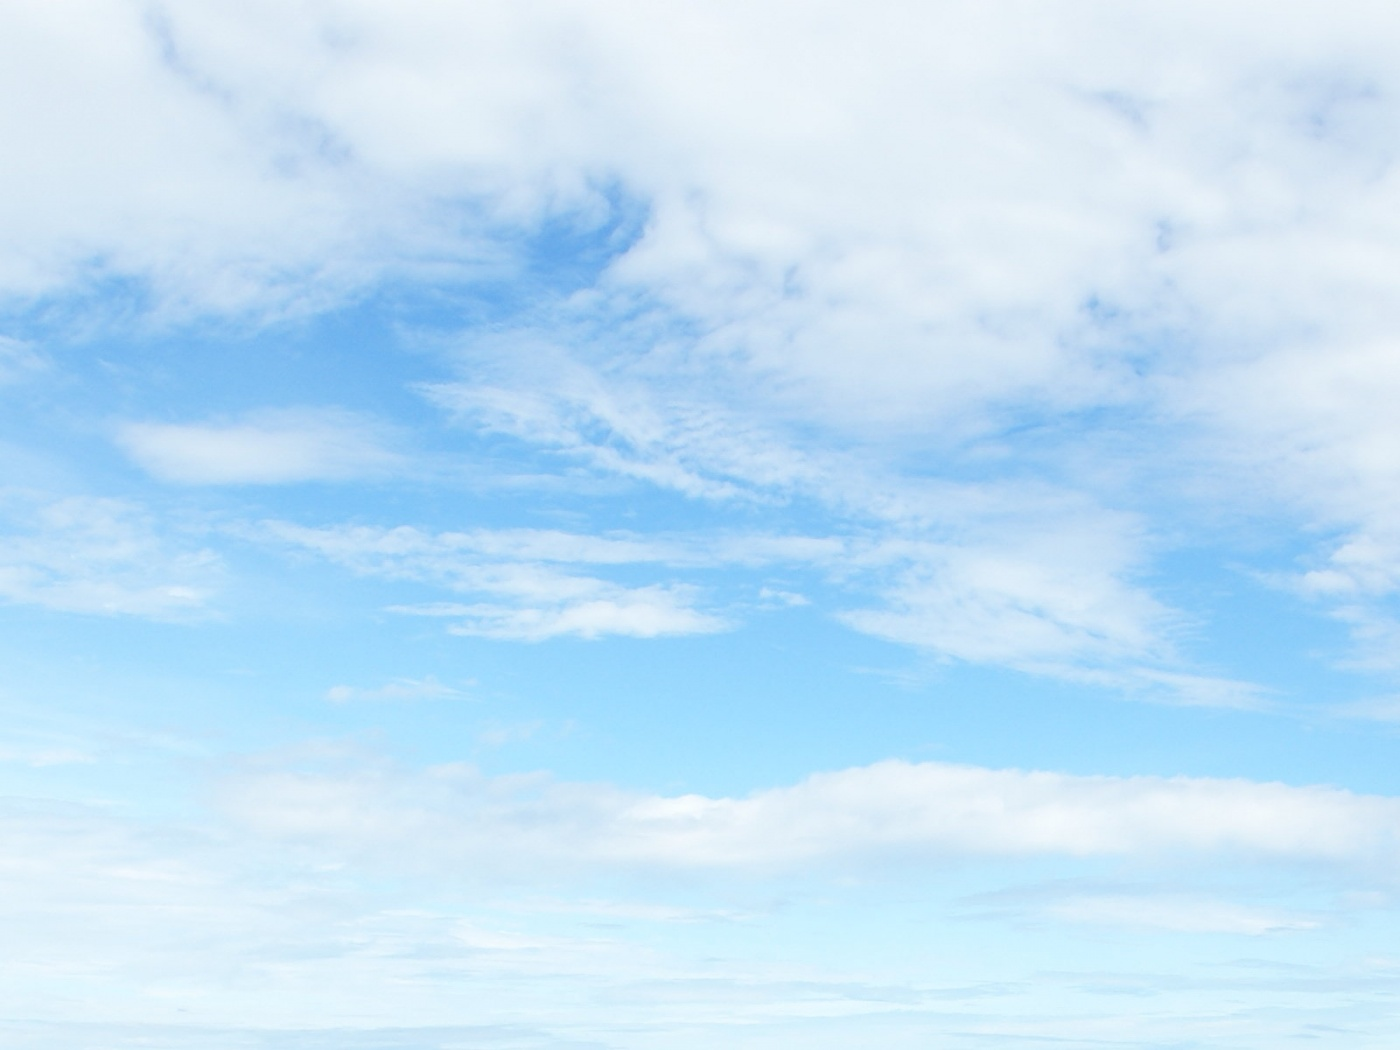 Sky wallpaper 1400x1050 37969